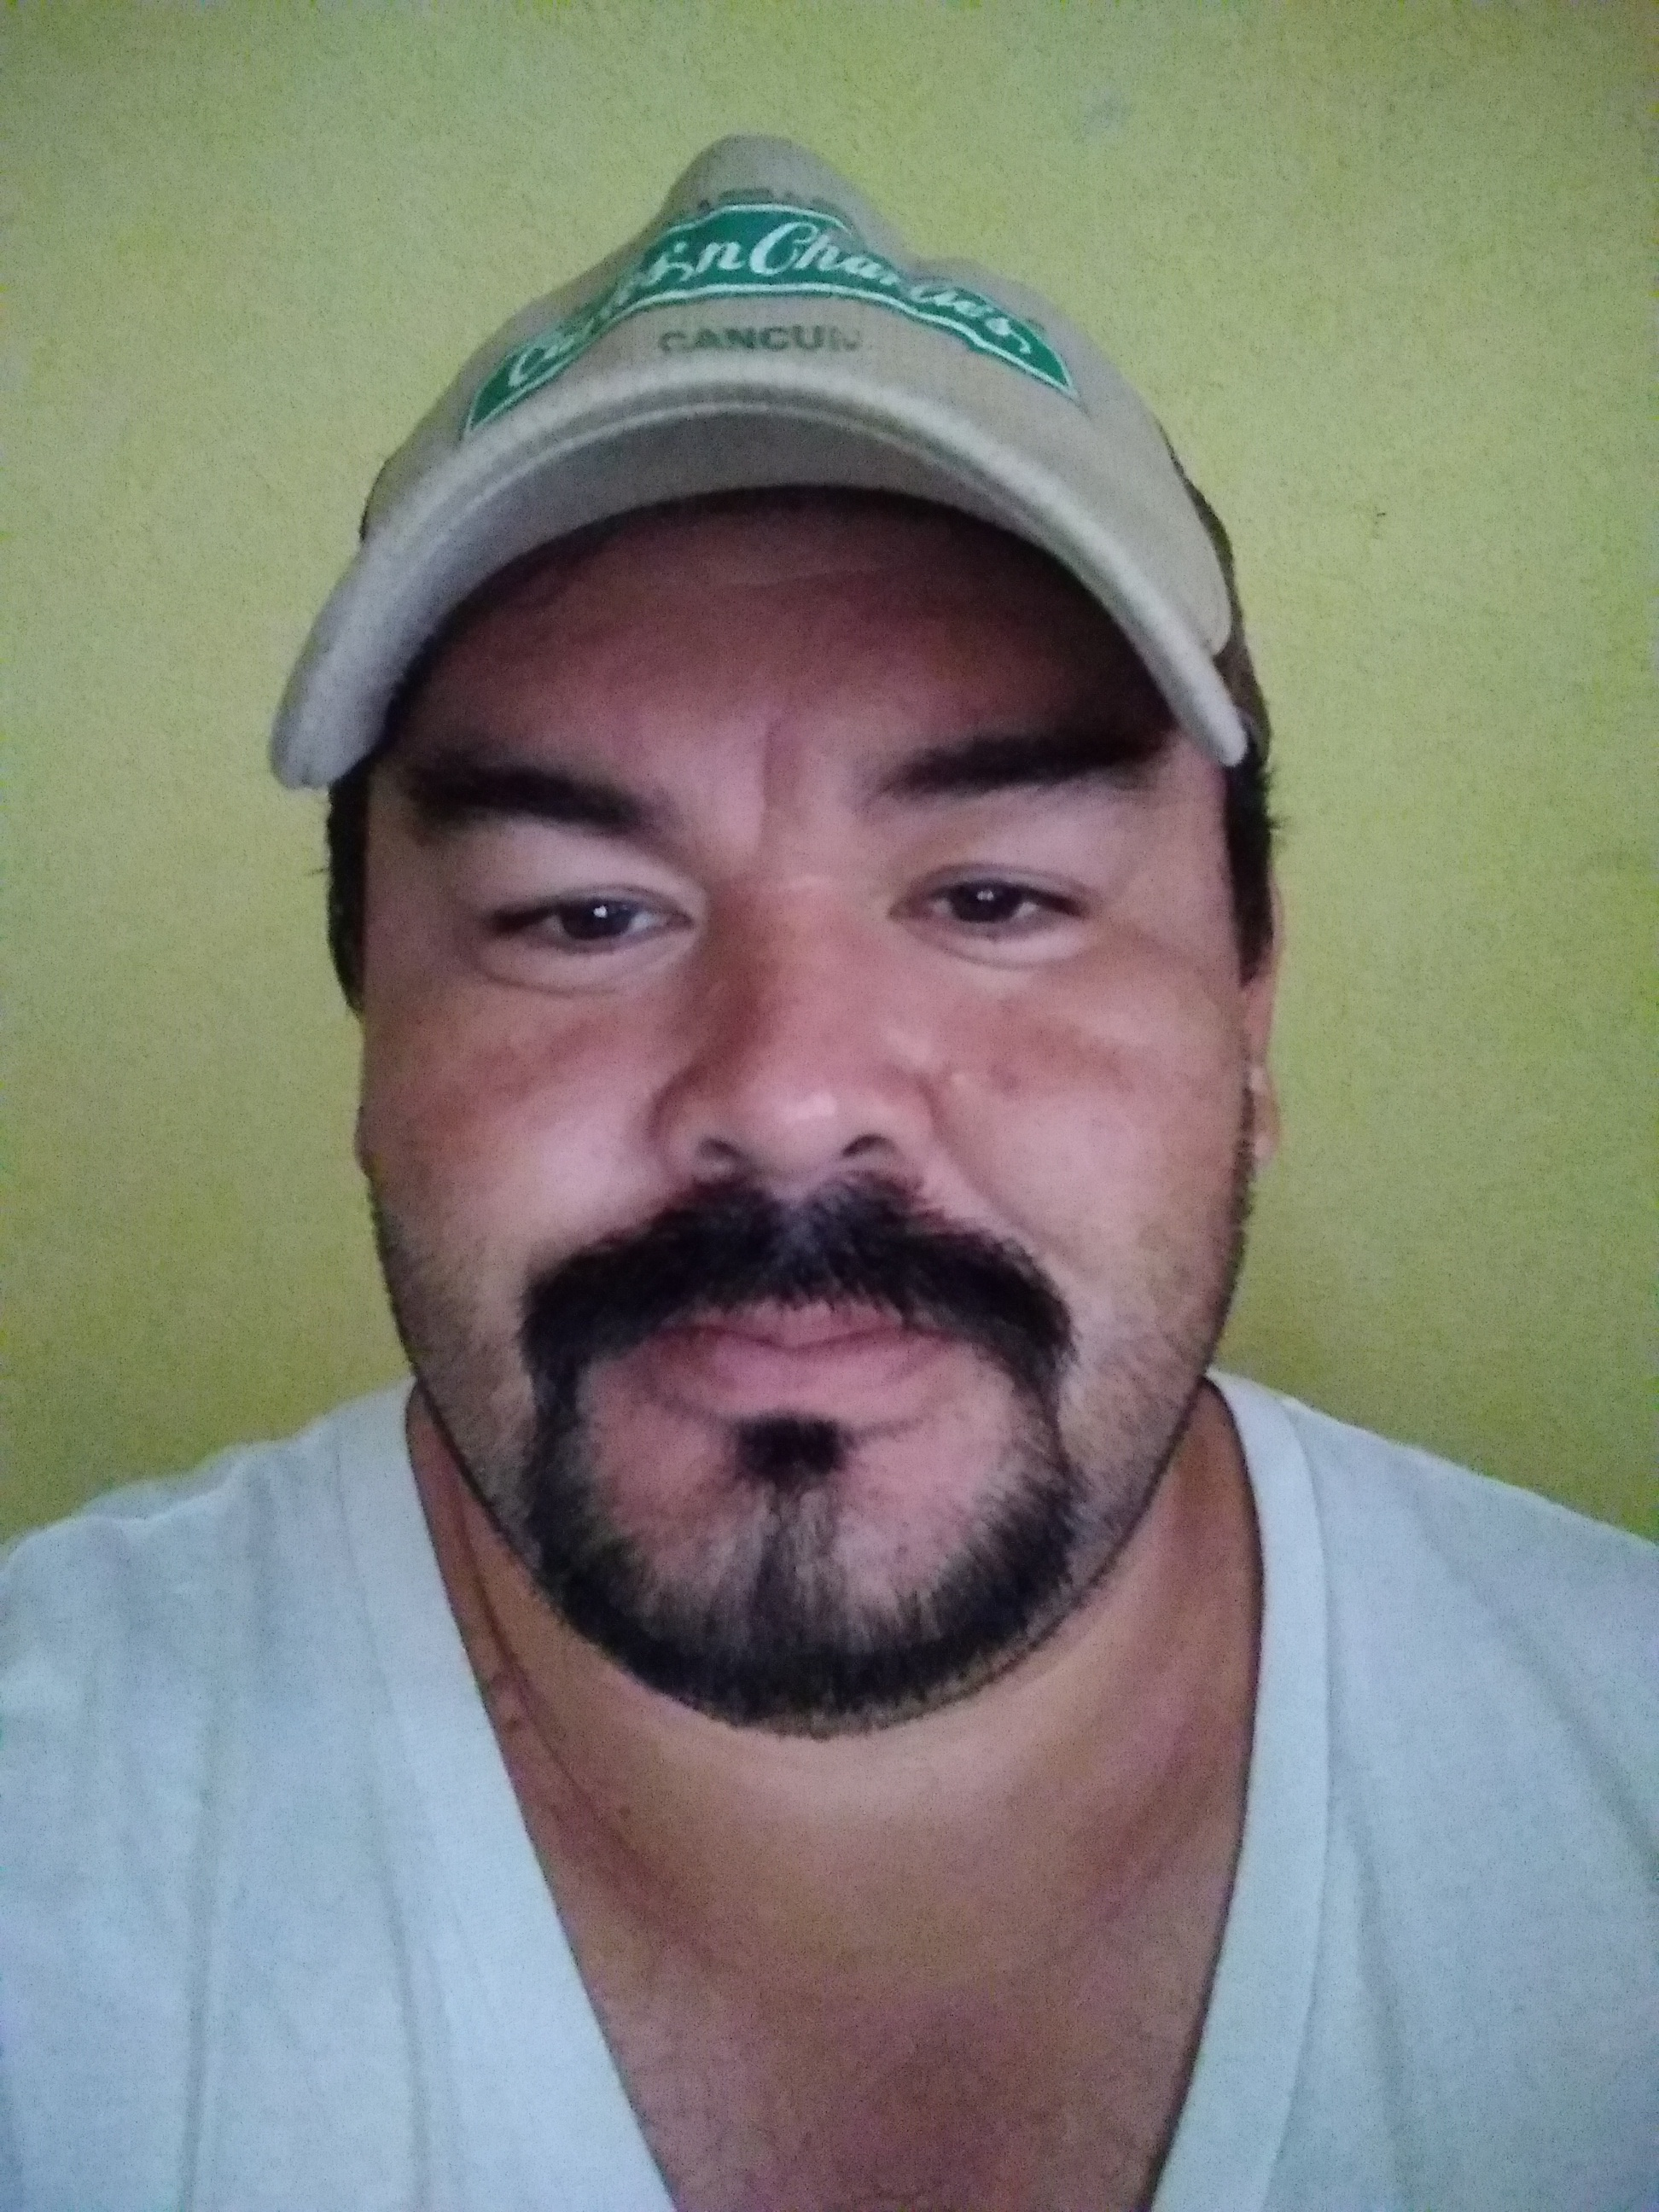 Alfredo Electricista